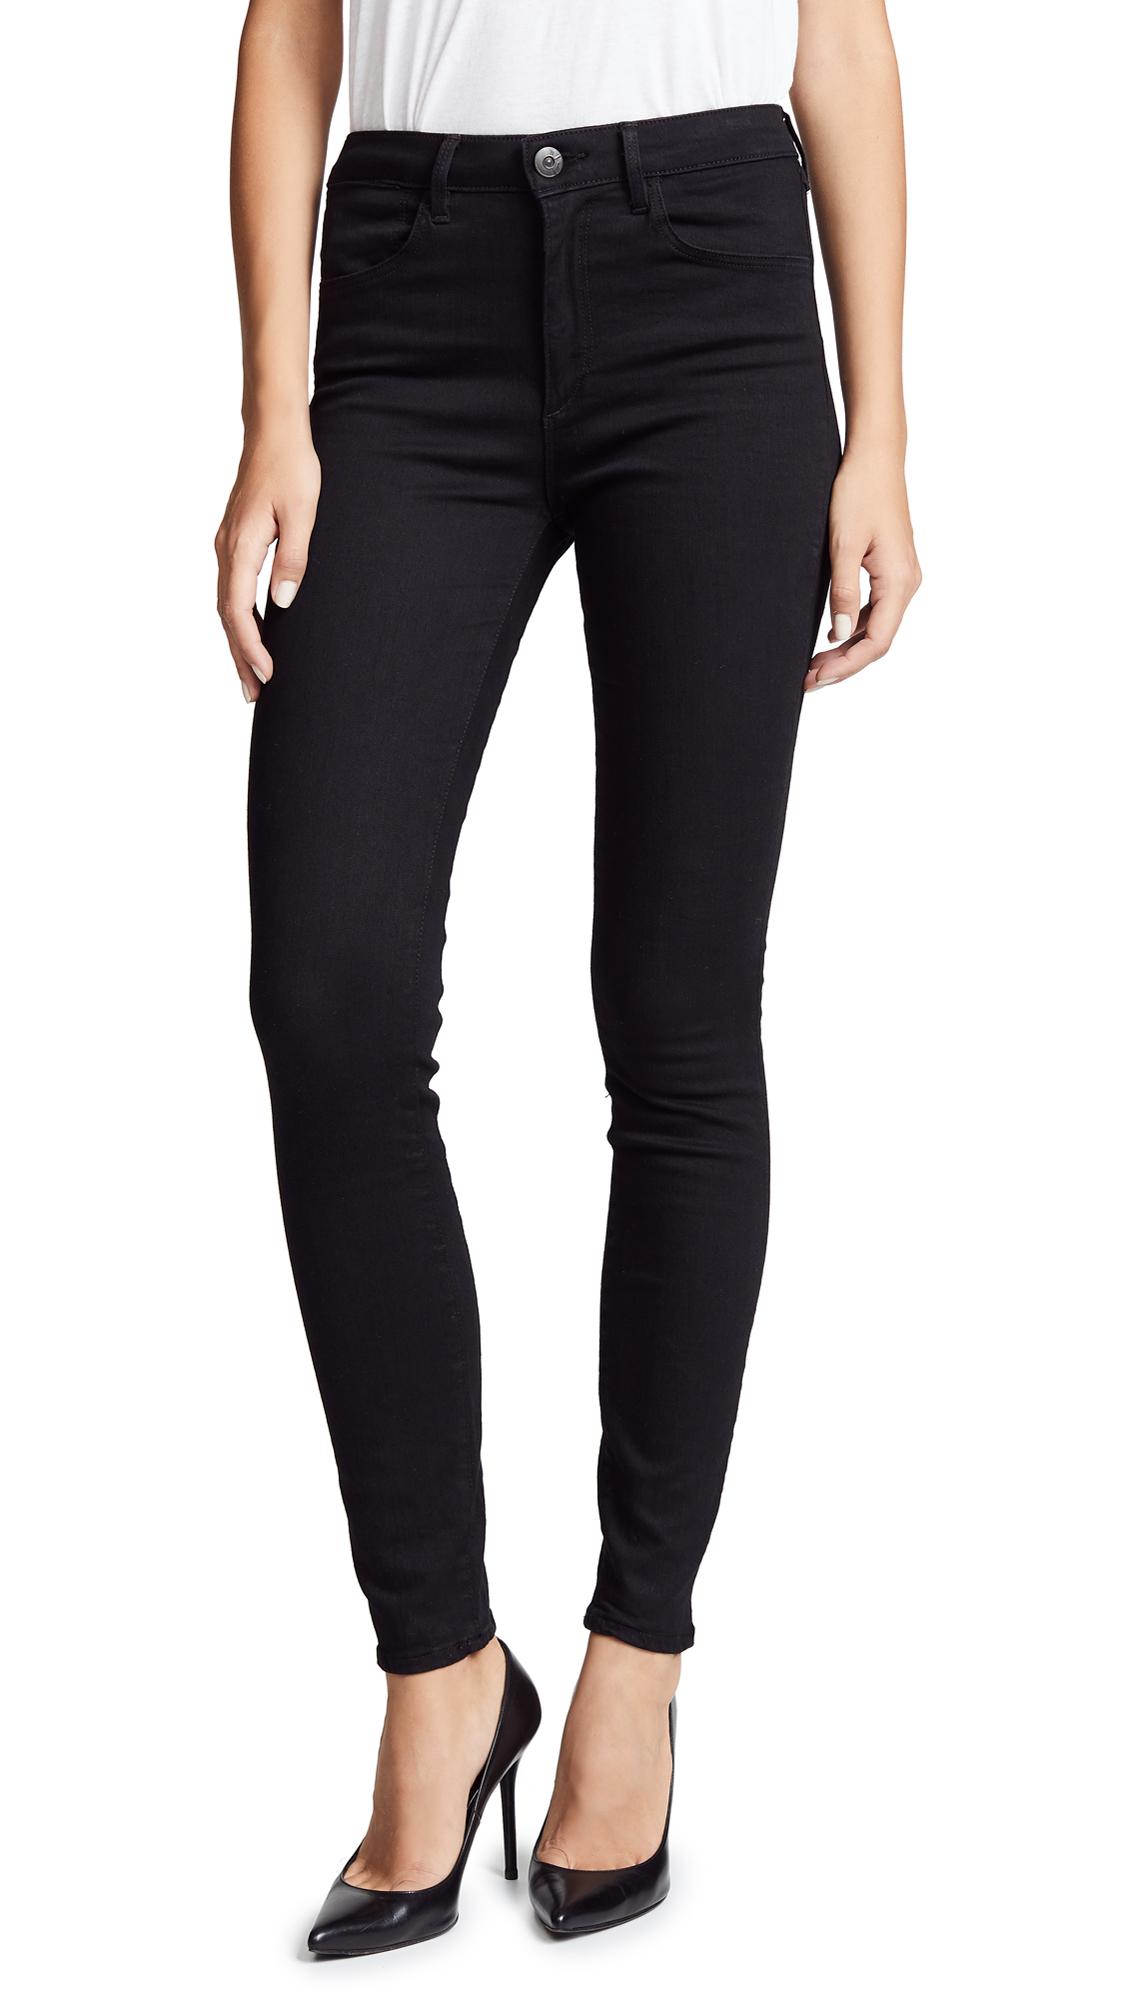 3x1 W3 Channel Seam Skinny Jeans - Black